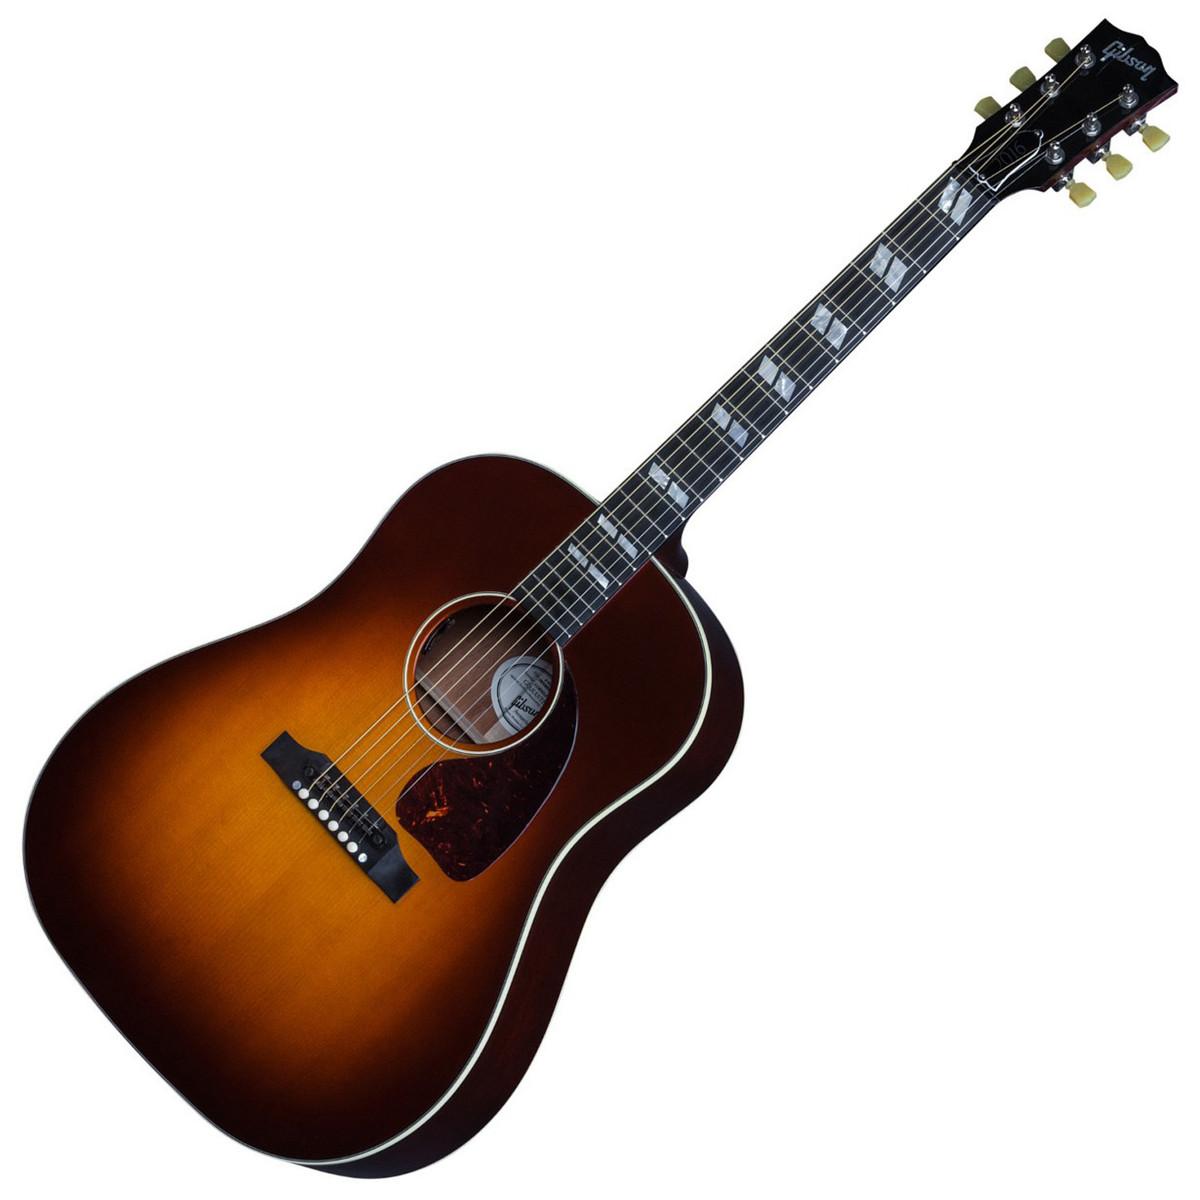 gibson 2016 j 45 progressive electro acoustic guitar autumn burst at. Black Bedroom Furniture Sets. Home Design Ideas